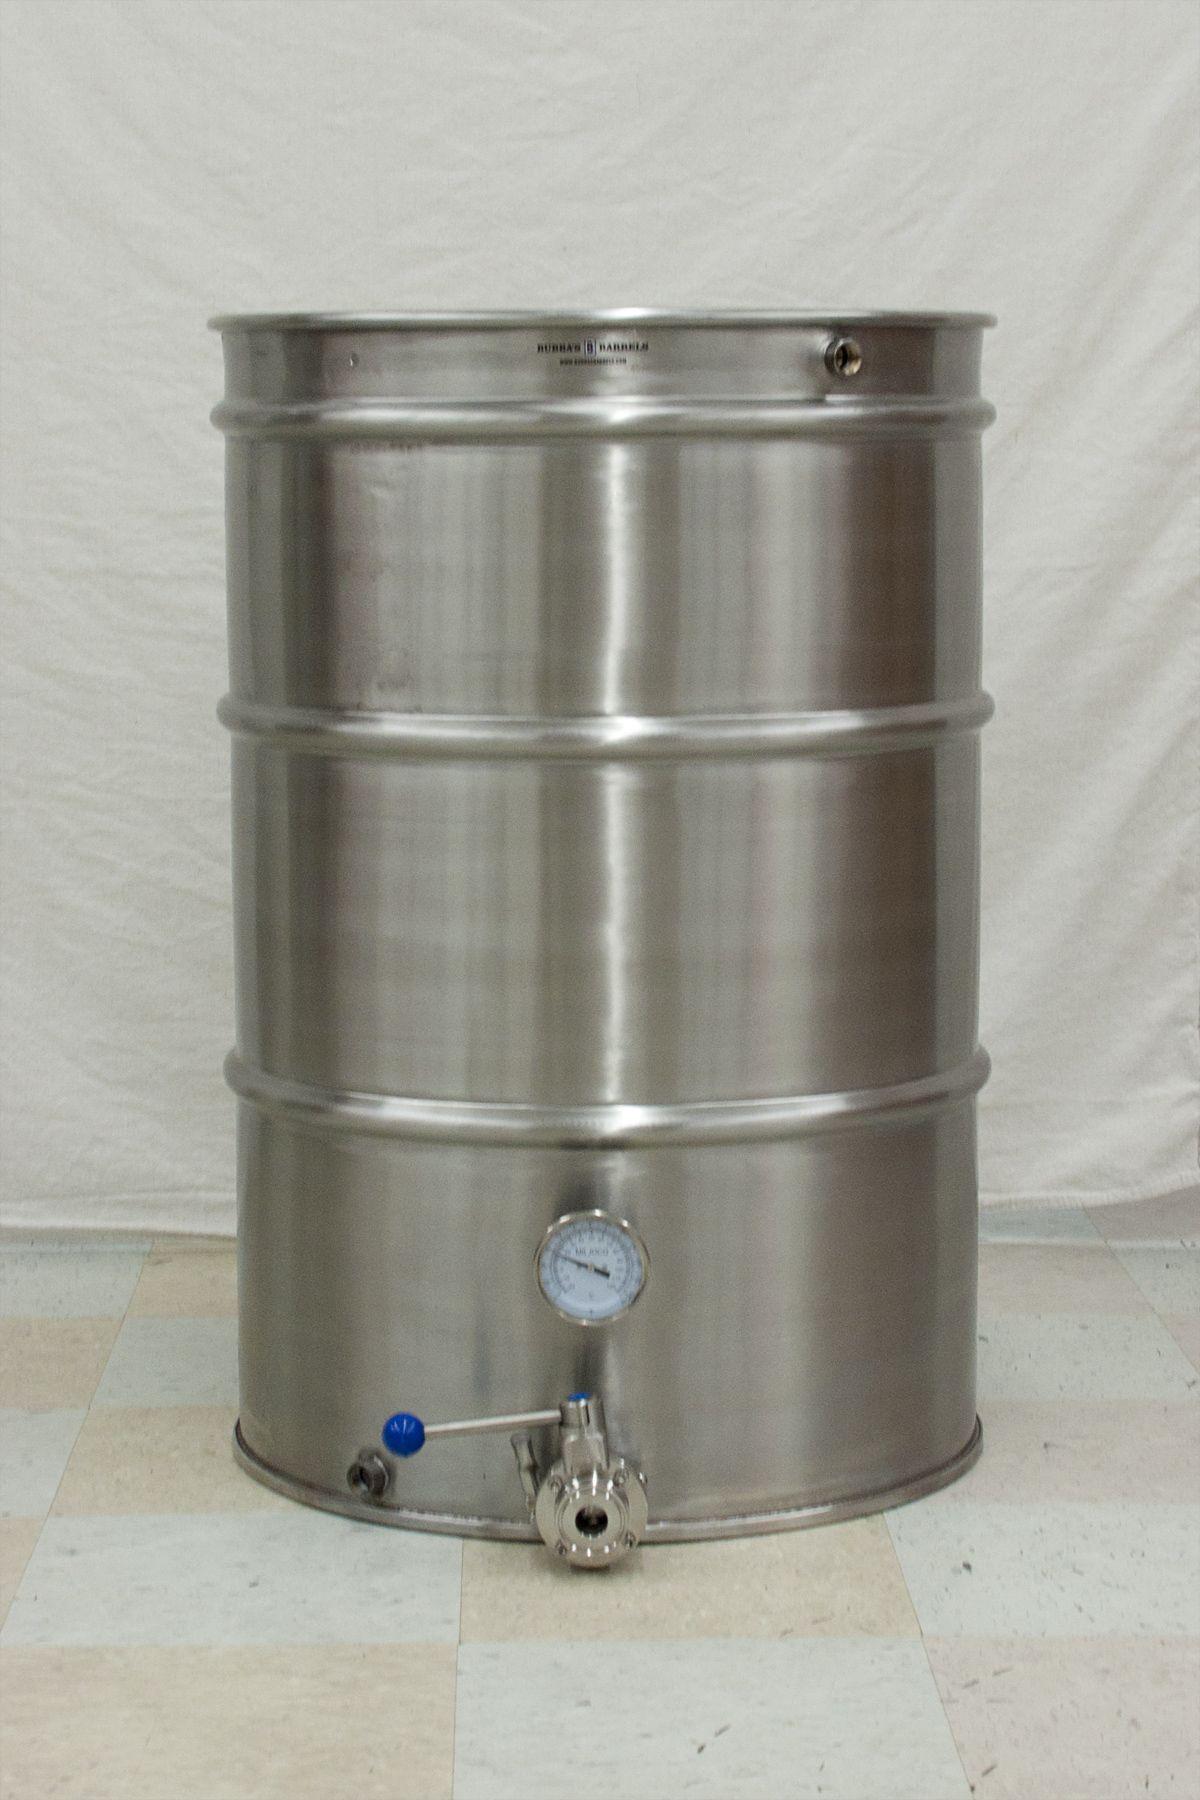 55 Gallon Brew Kettle Bubba S Barrels Kombucha Home Brewing Equipment Brewing